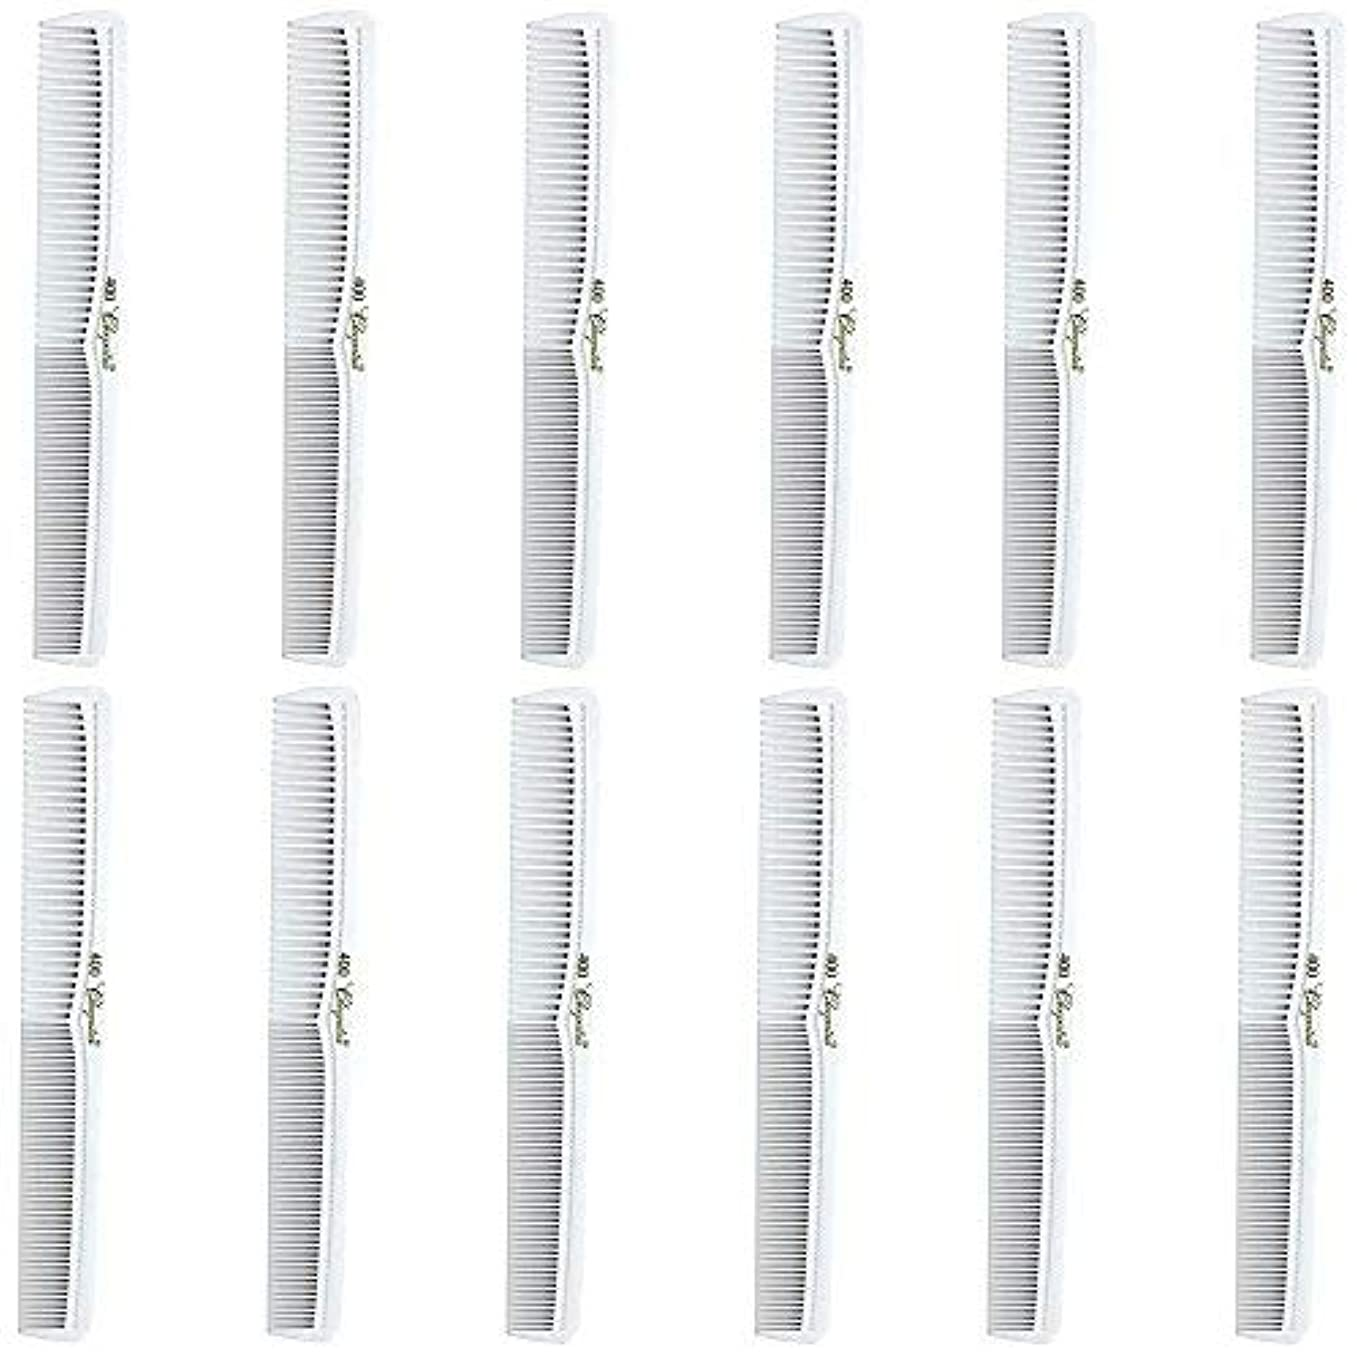 Barber Beauty Hair Cleopatra 400 All Purpose Comb (12 Pack) 12 x SB-C400-WHITE [並行輸入品]